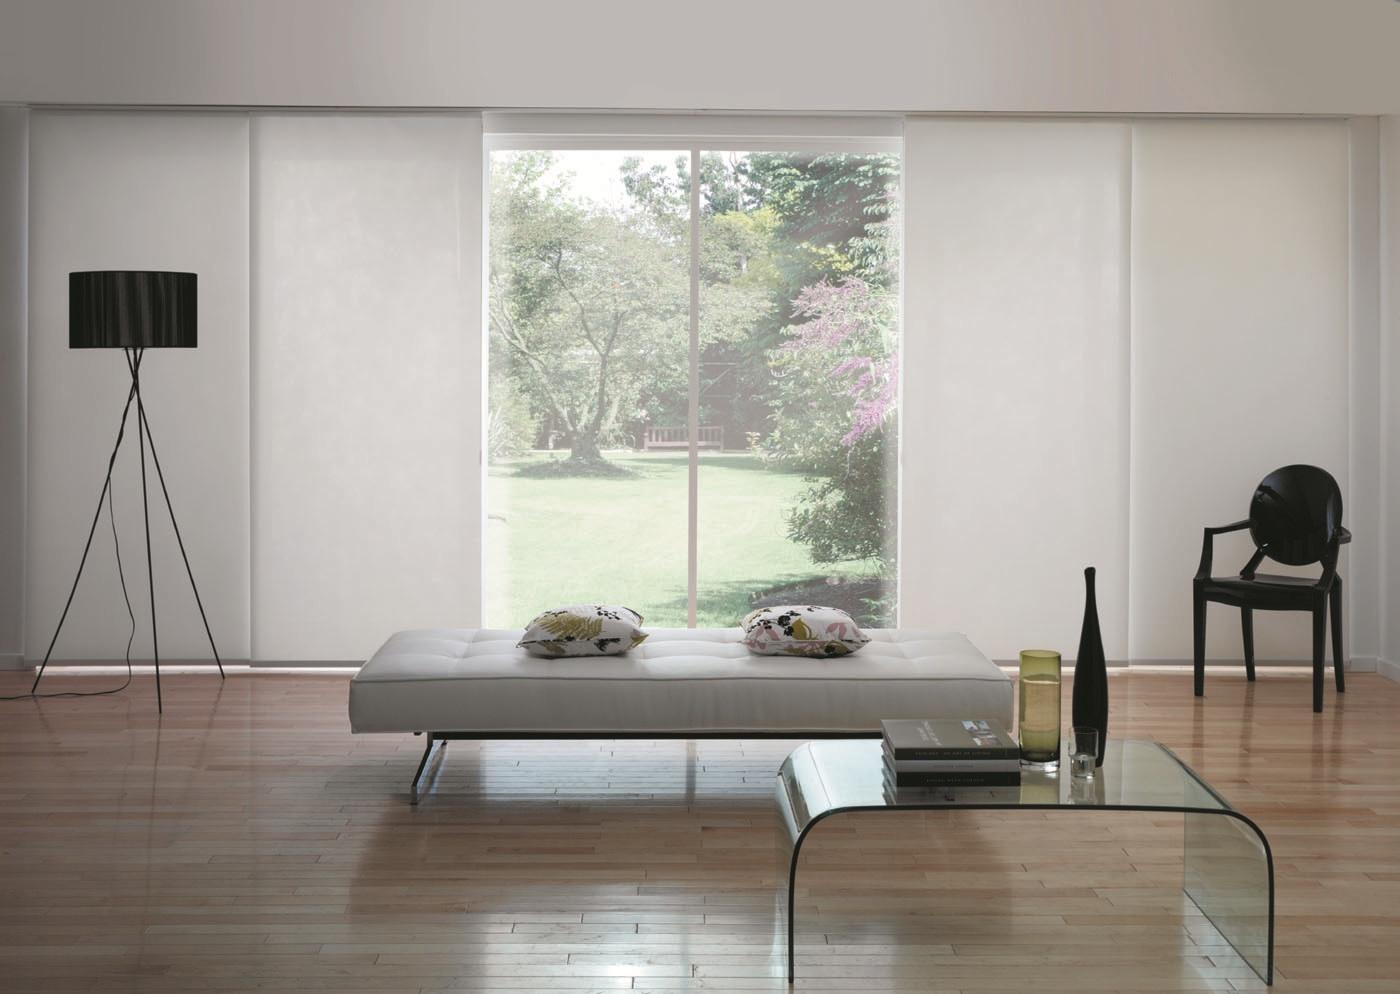 Tela para panel japones paneles trasl cidos for Telas para paneles japoneses